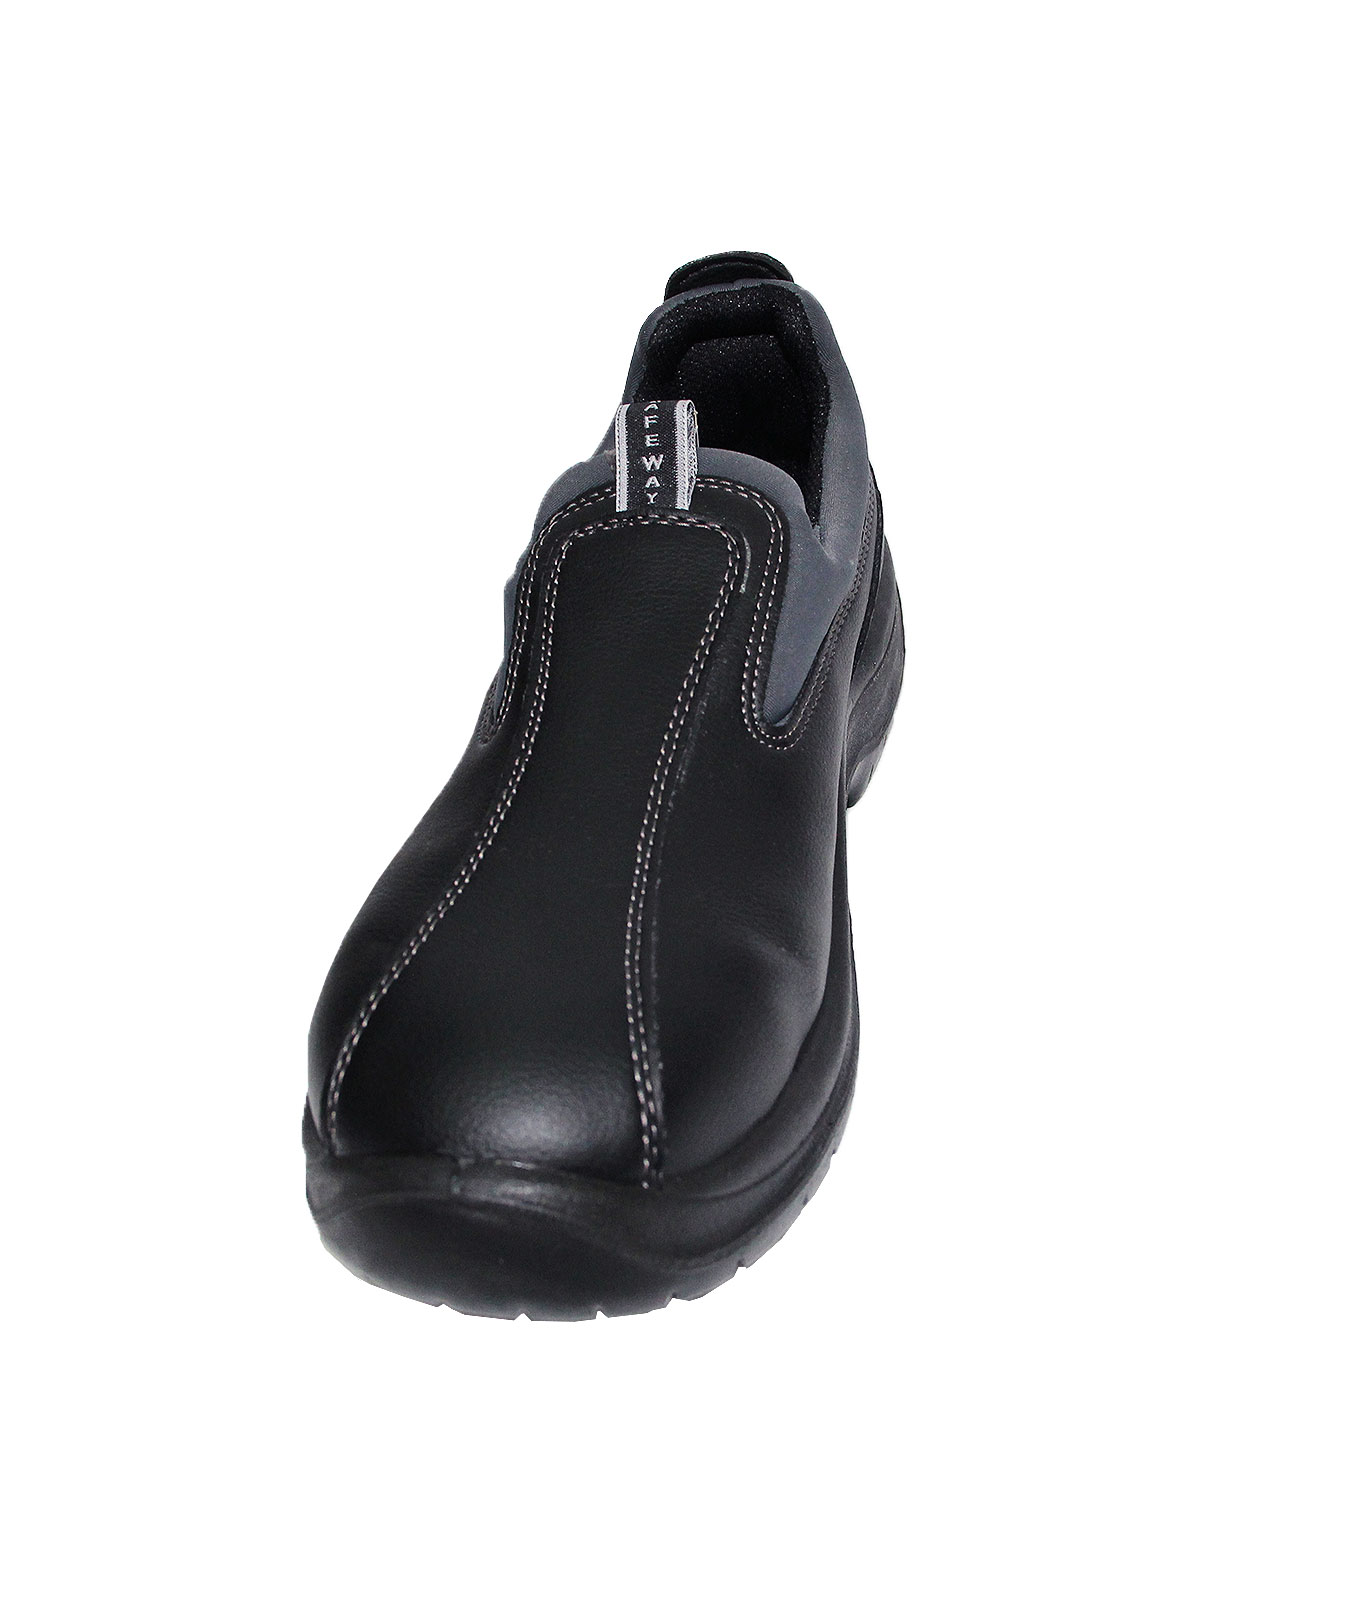 MALIBU παπούτσι εργασίας 2